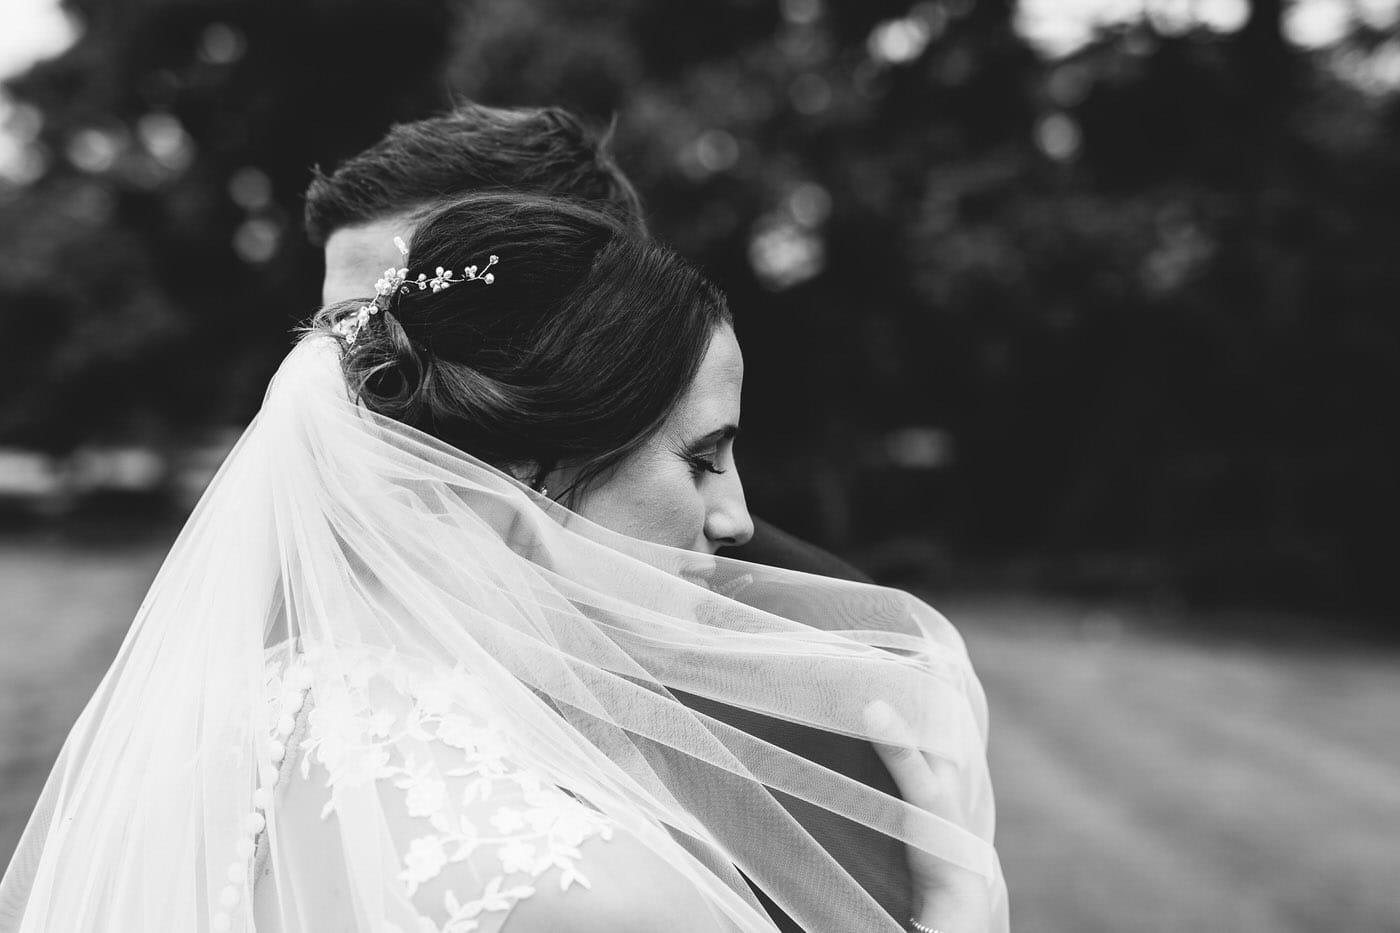 AA PENTREMAWRNORTH WALES WEDDING 1819